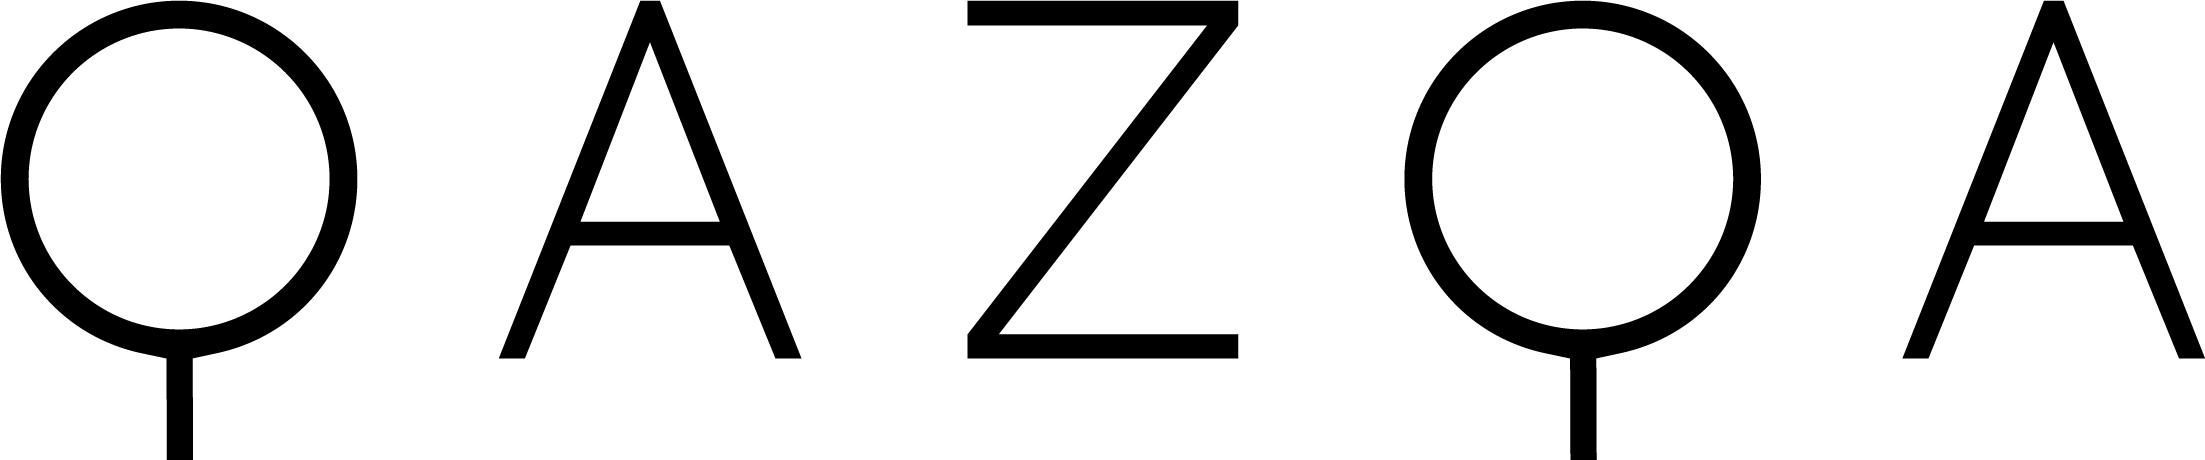 qazqa brand logo